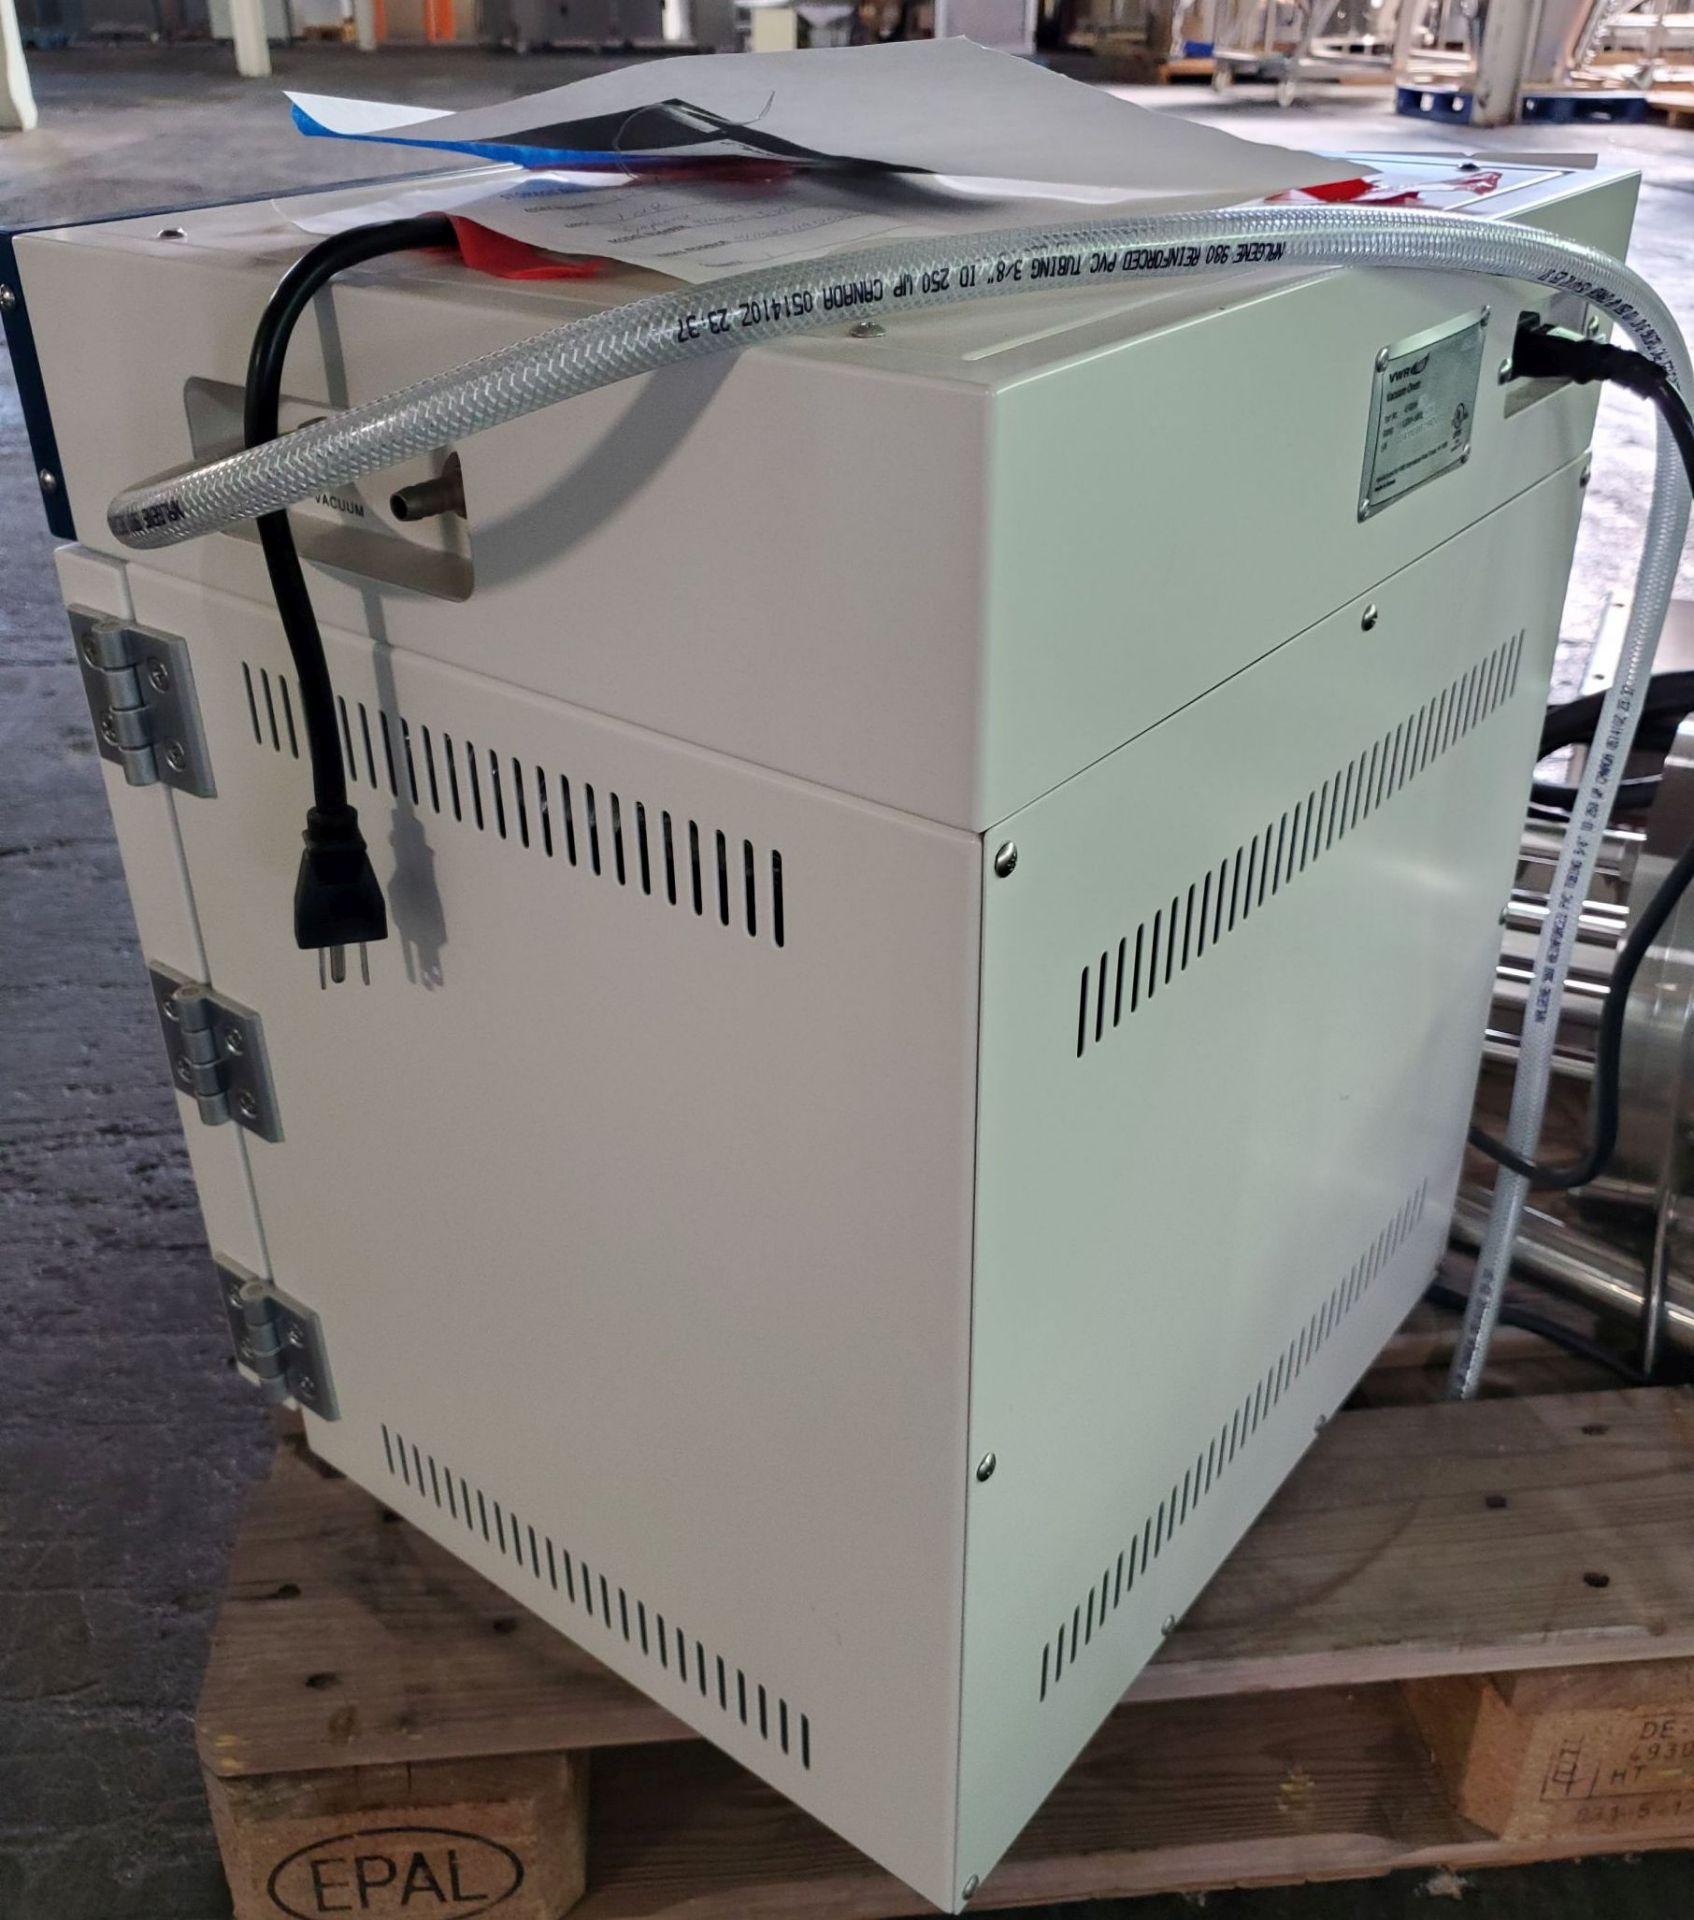 "Lot 7 - VWR Symphony Vaccum Oven, part# 414004-578, external vacuum, 10""wide x 11"" deep x 10"" high"